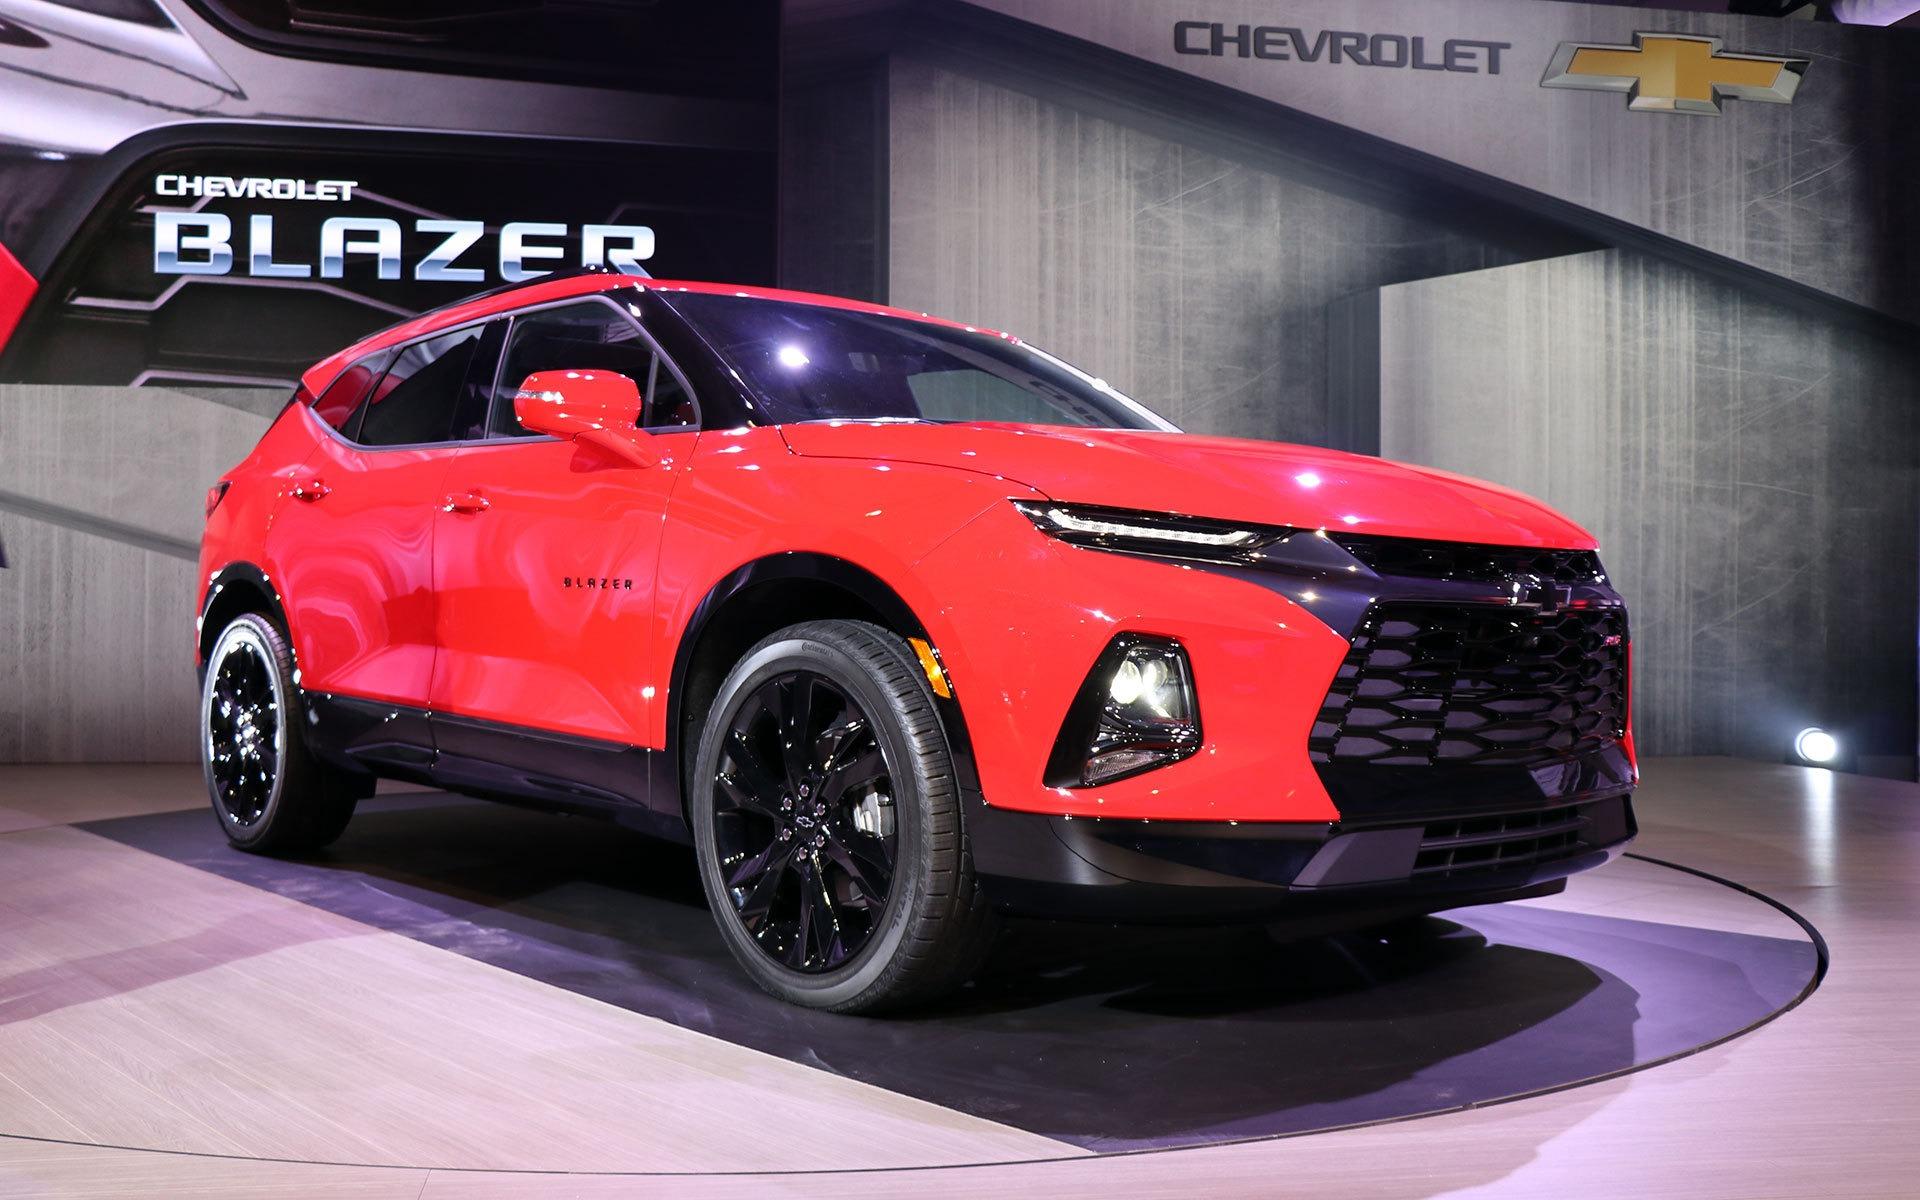 Chevrolet Blazer 2019 : le grand retour - 1/28